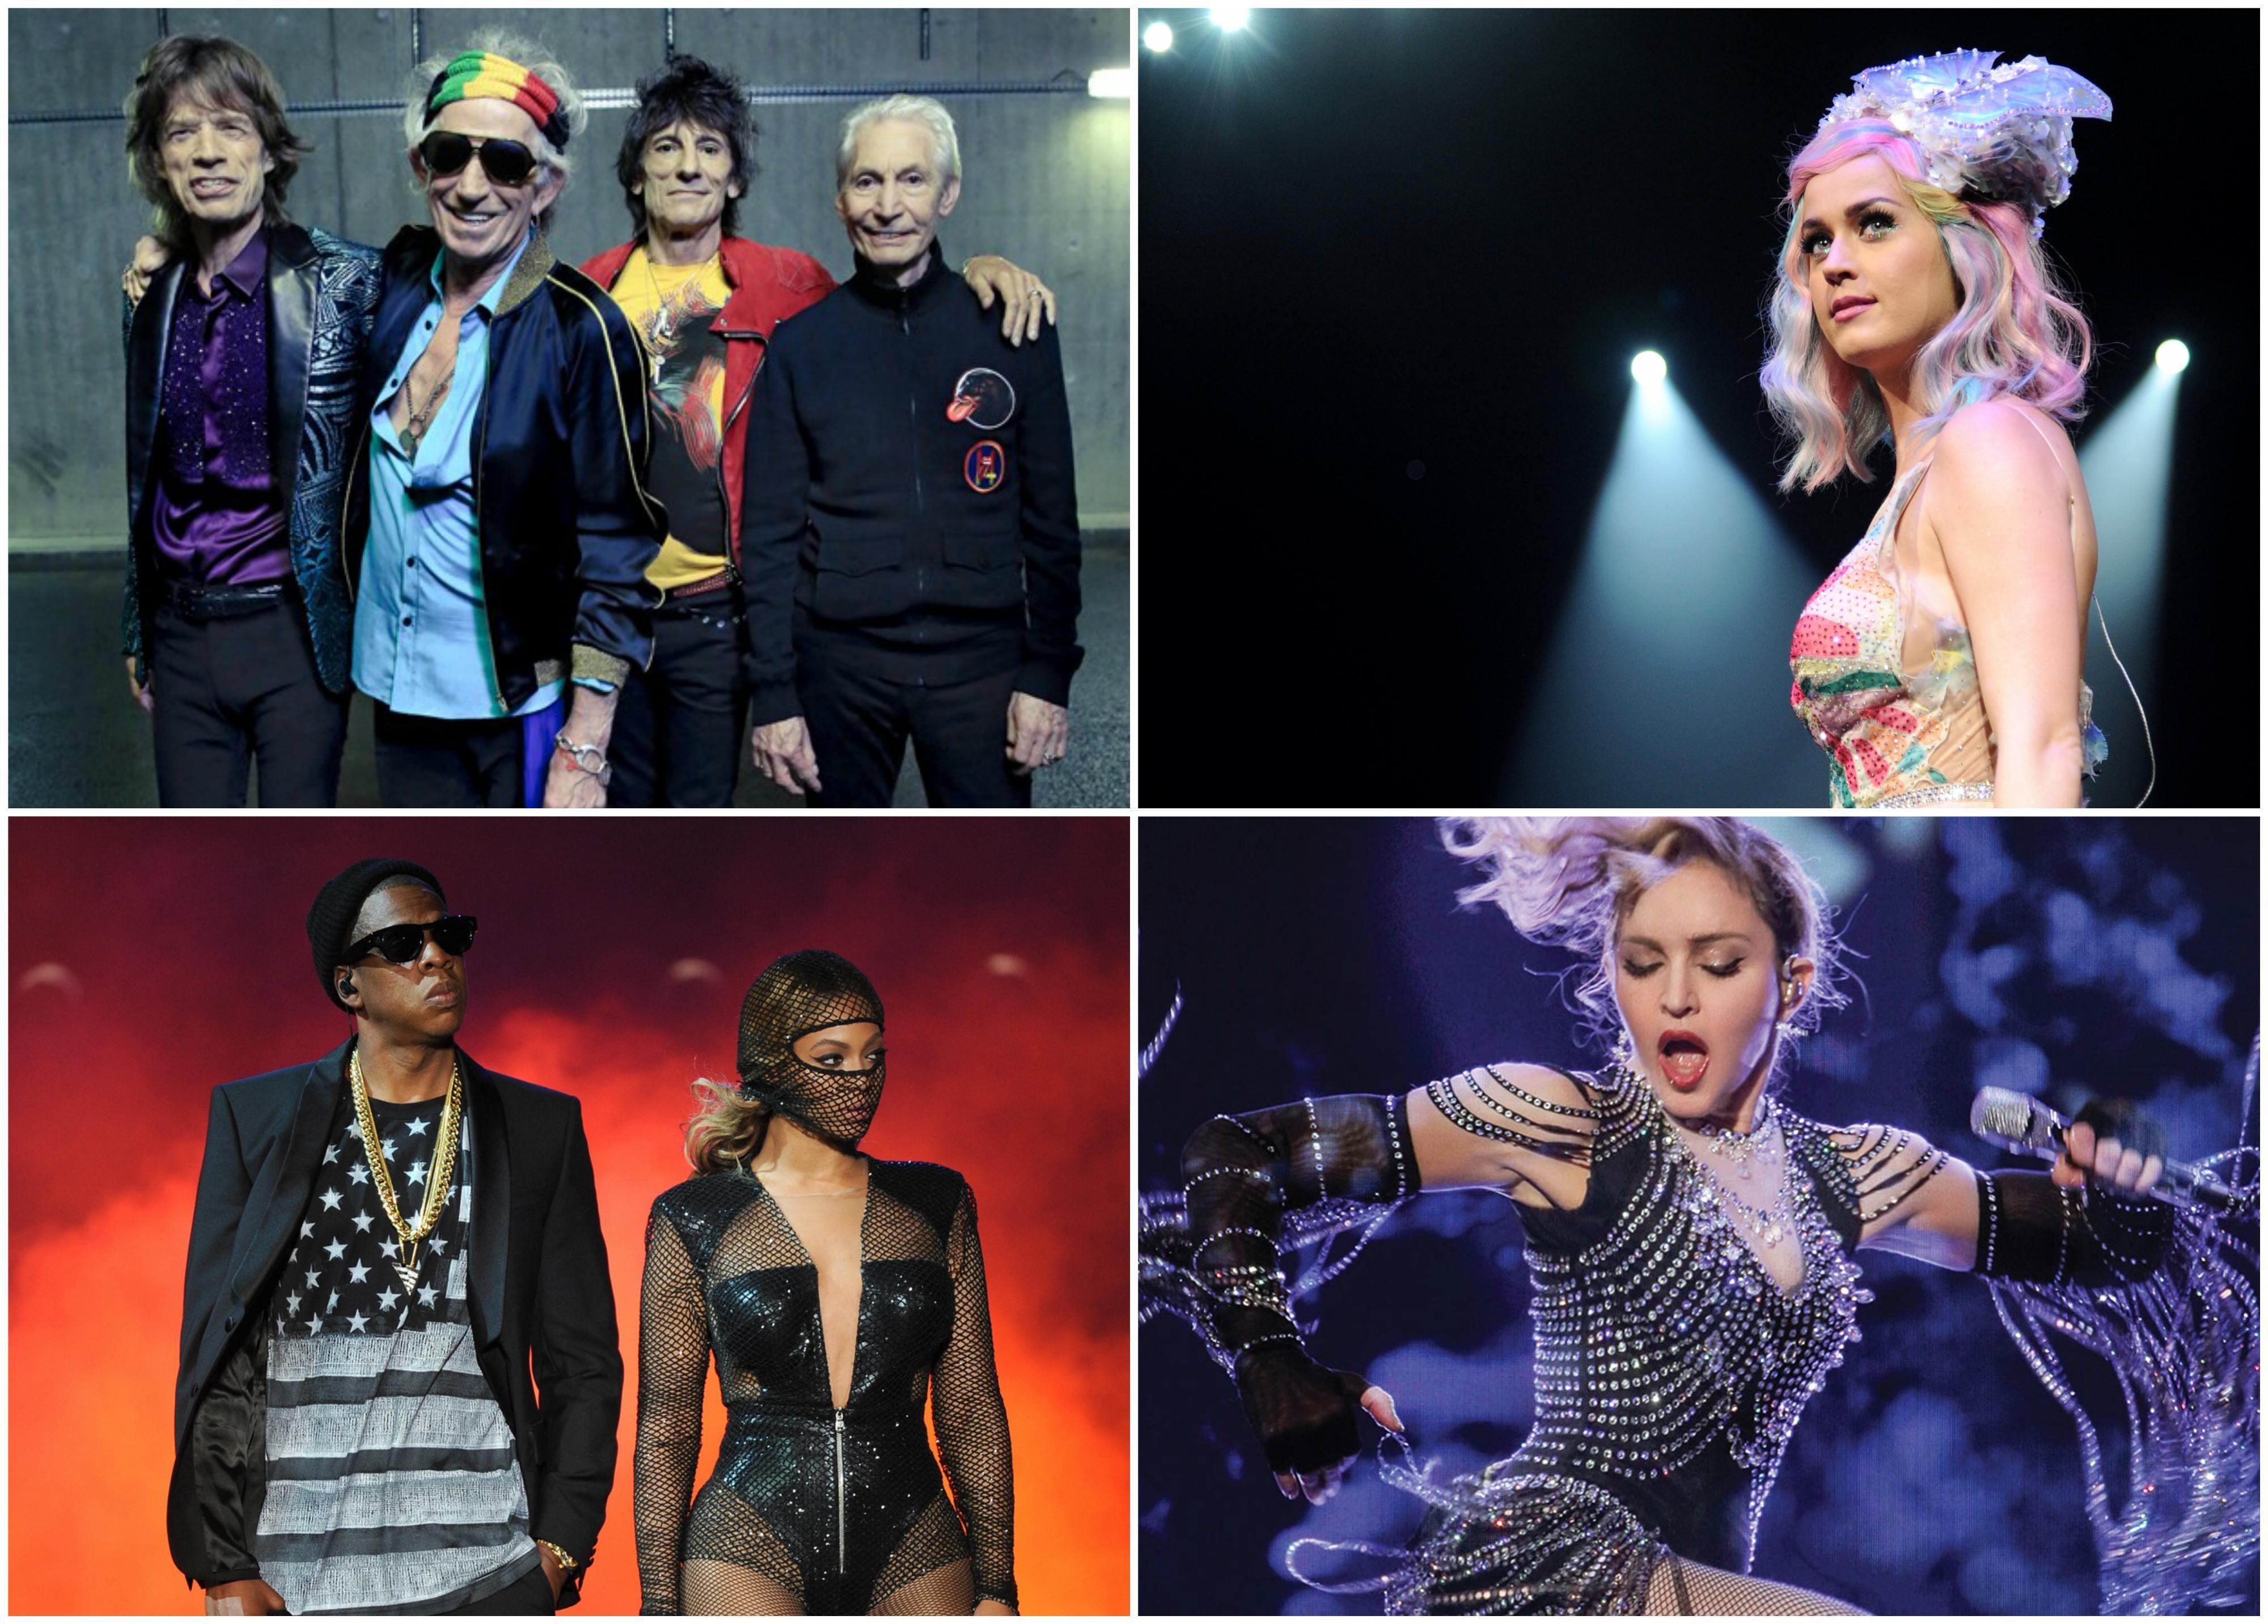 Rolling Stones, Katy Perry, Beyonc, Jay-Z e Madonna comandam a ltima noite do ano no Bis (Foto: Divulgao)